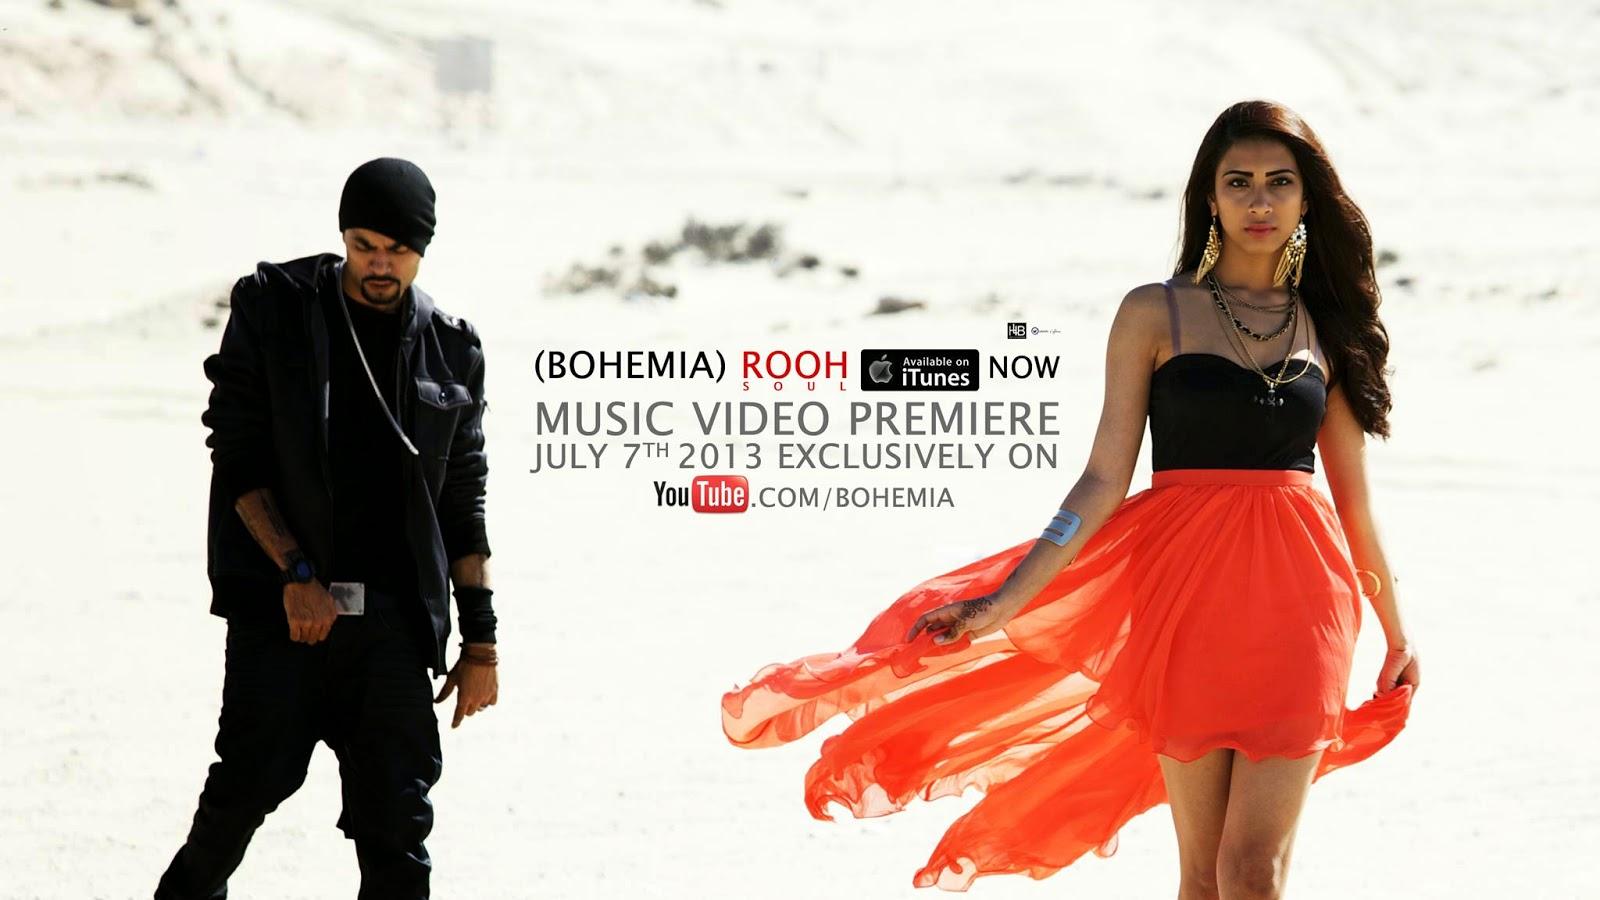 Rooh  Soul  by BohemiaBohemia Rooh